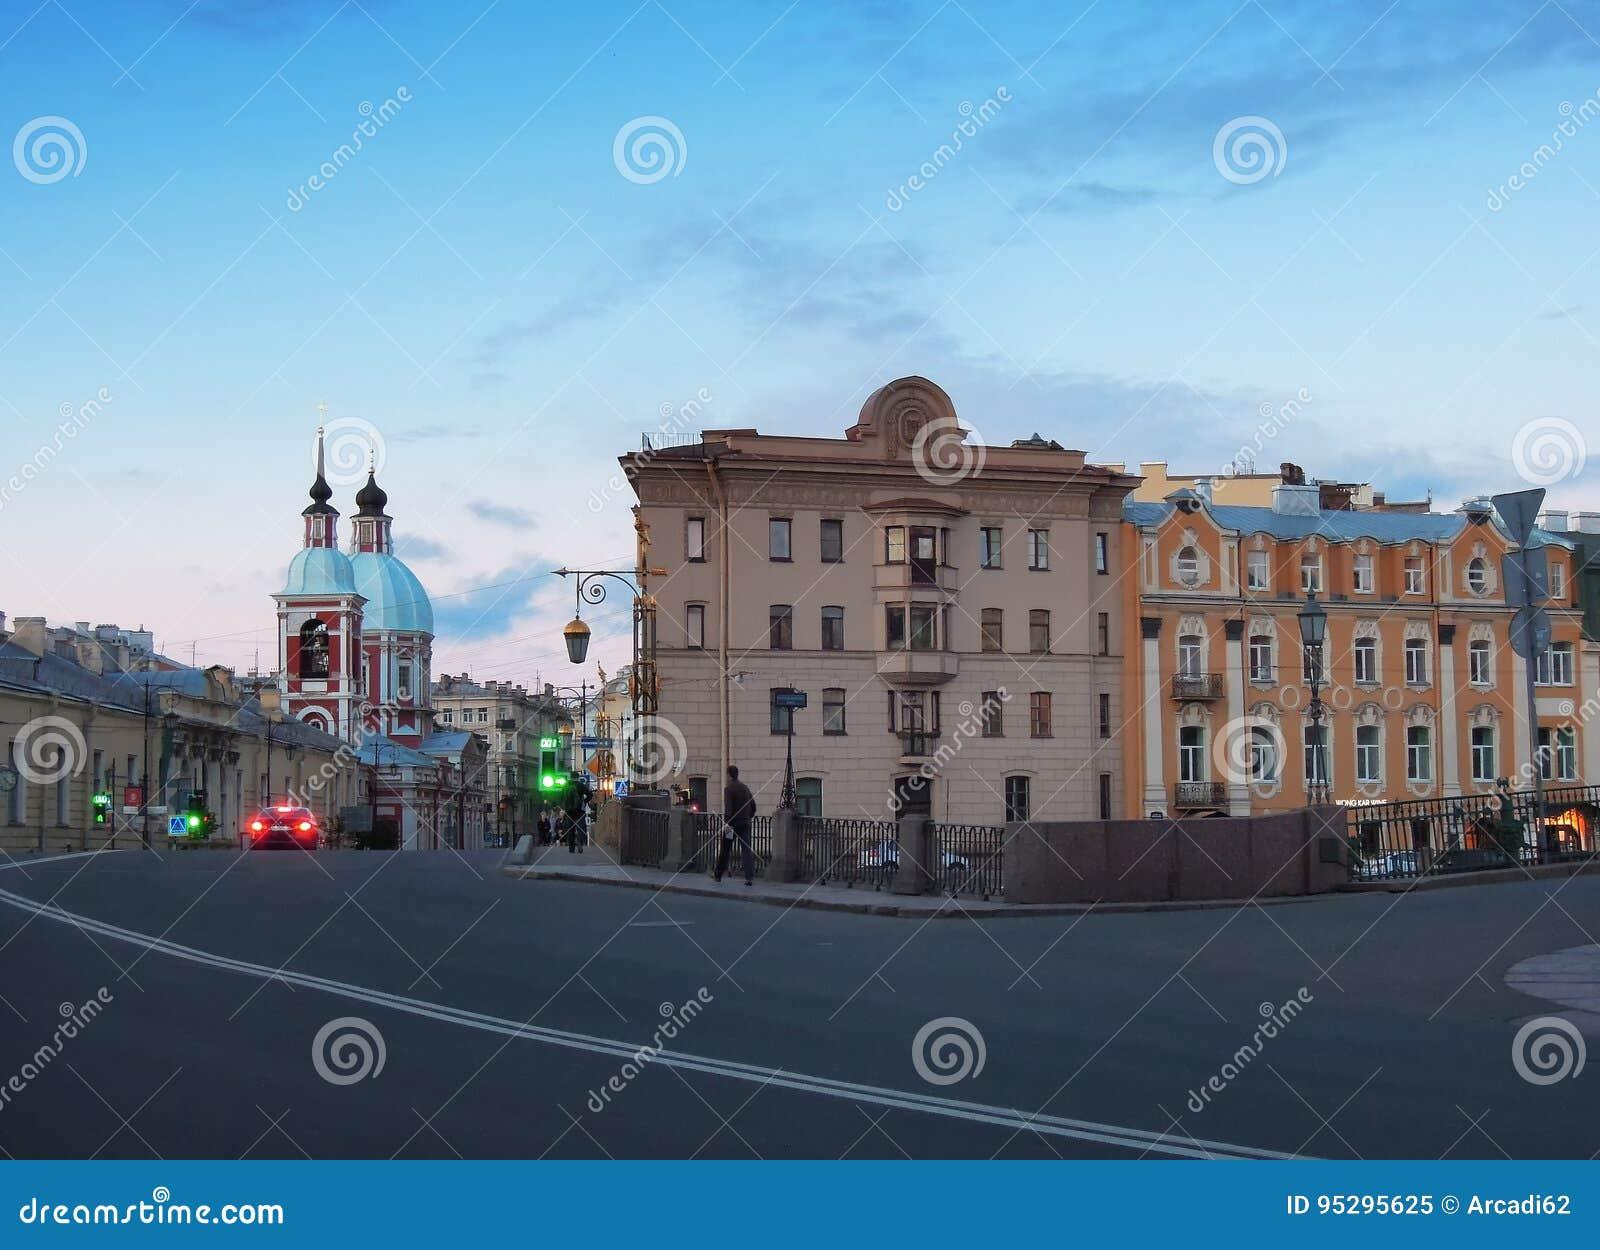 St för domkyrkacupolaisaac petersburg russia s saint